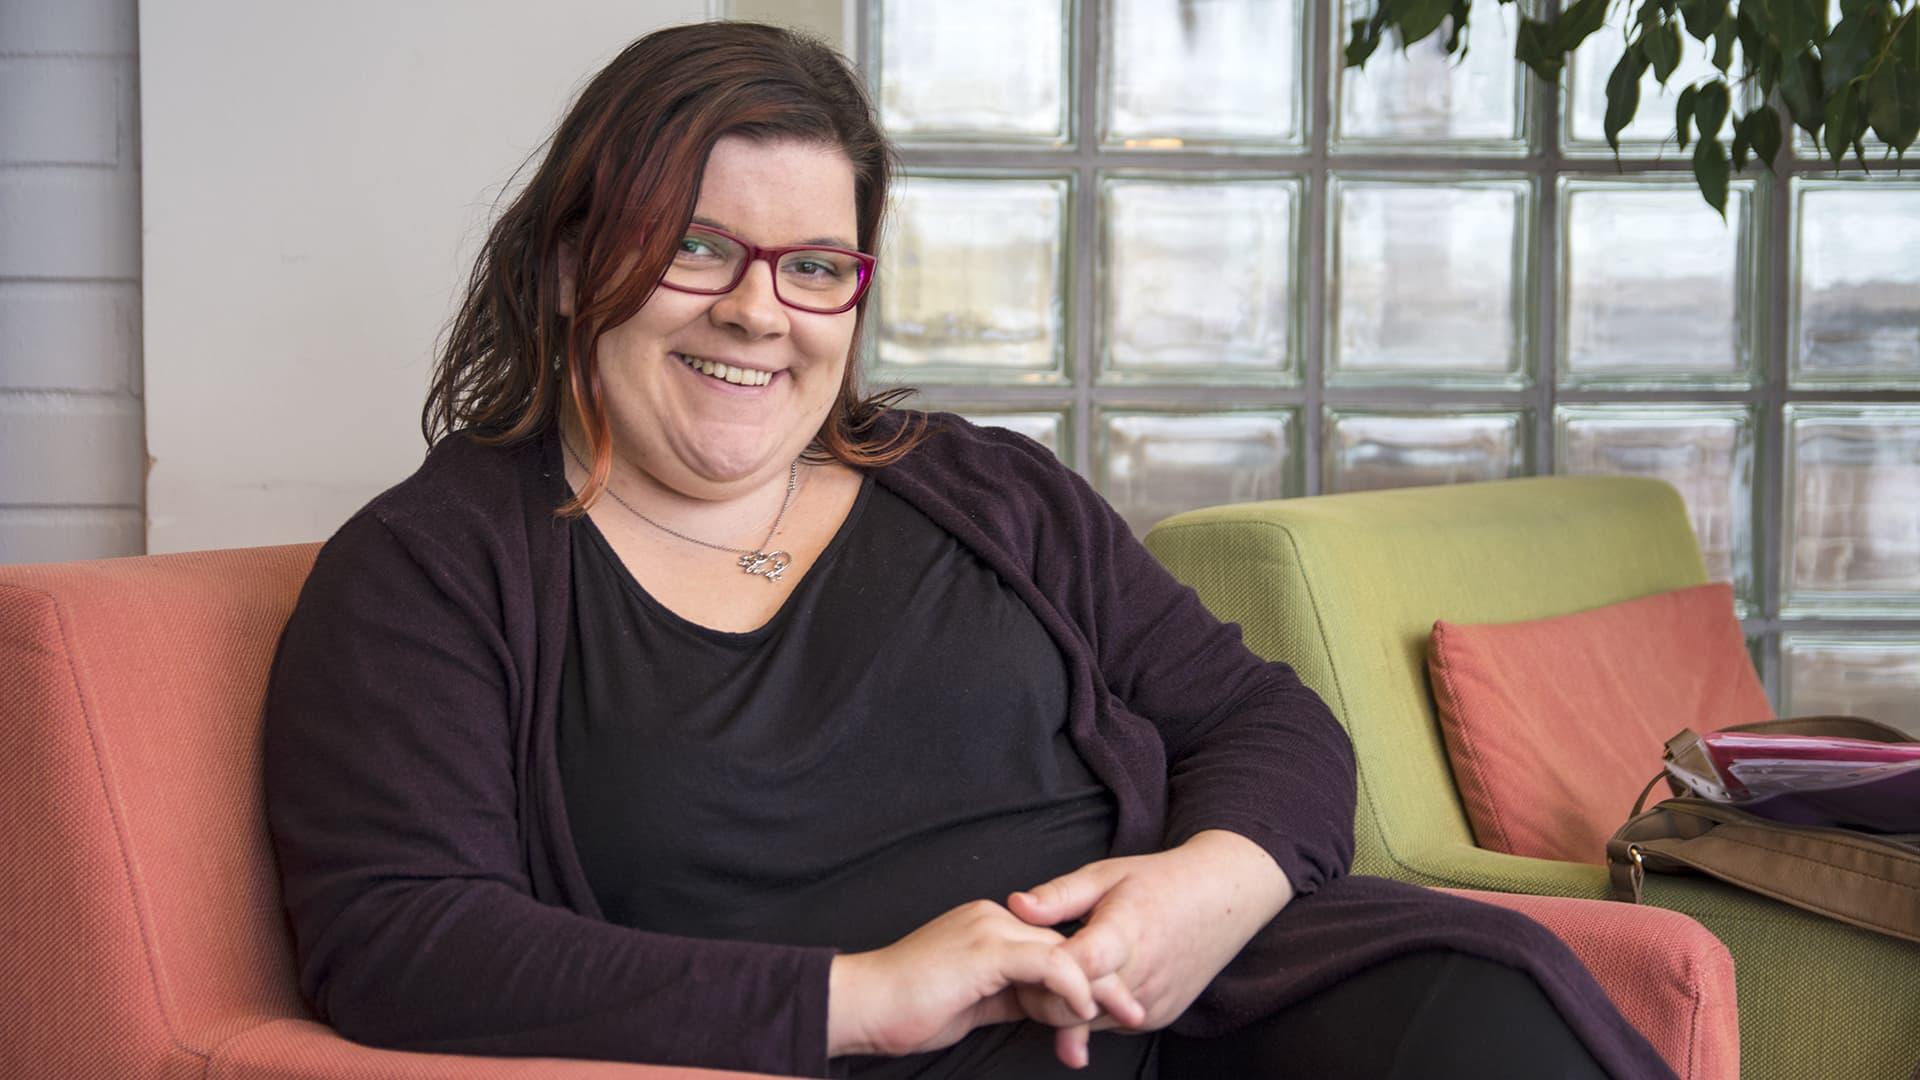 Sonja Koskela istuu  nojatuolissa ja hymyilee kameralle.